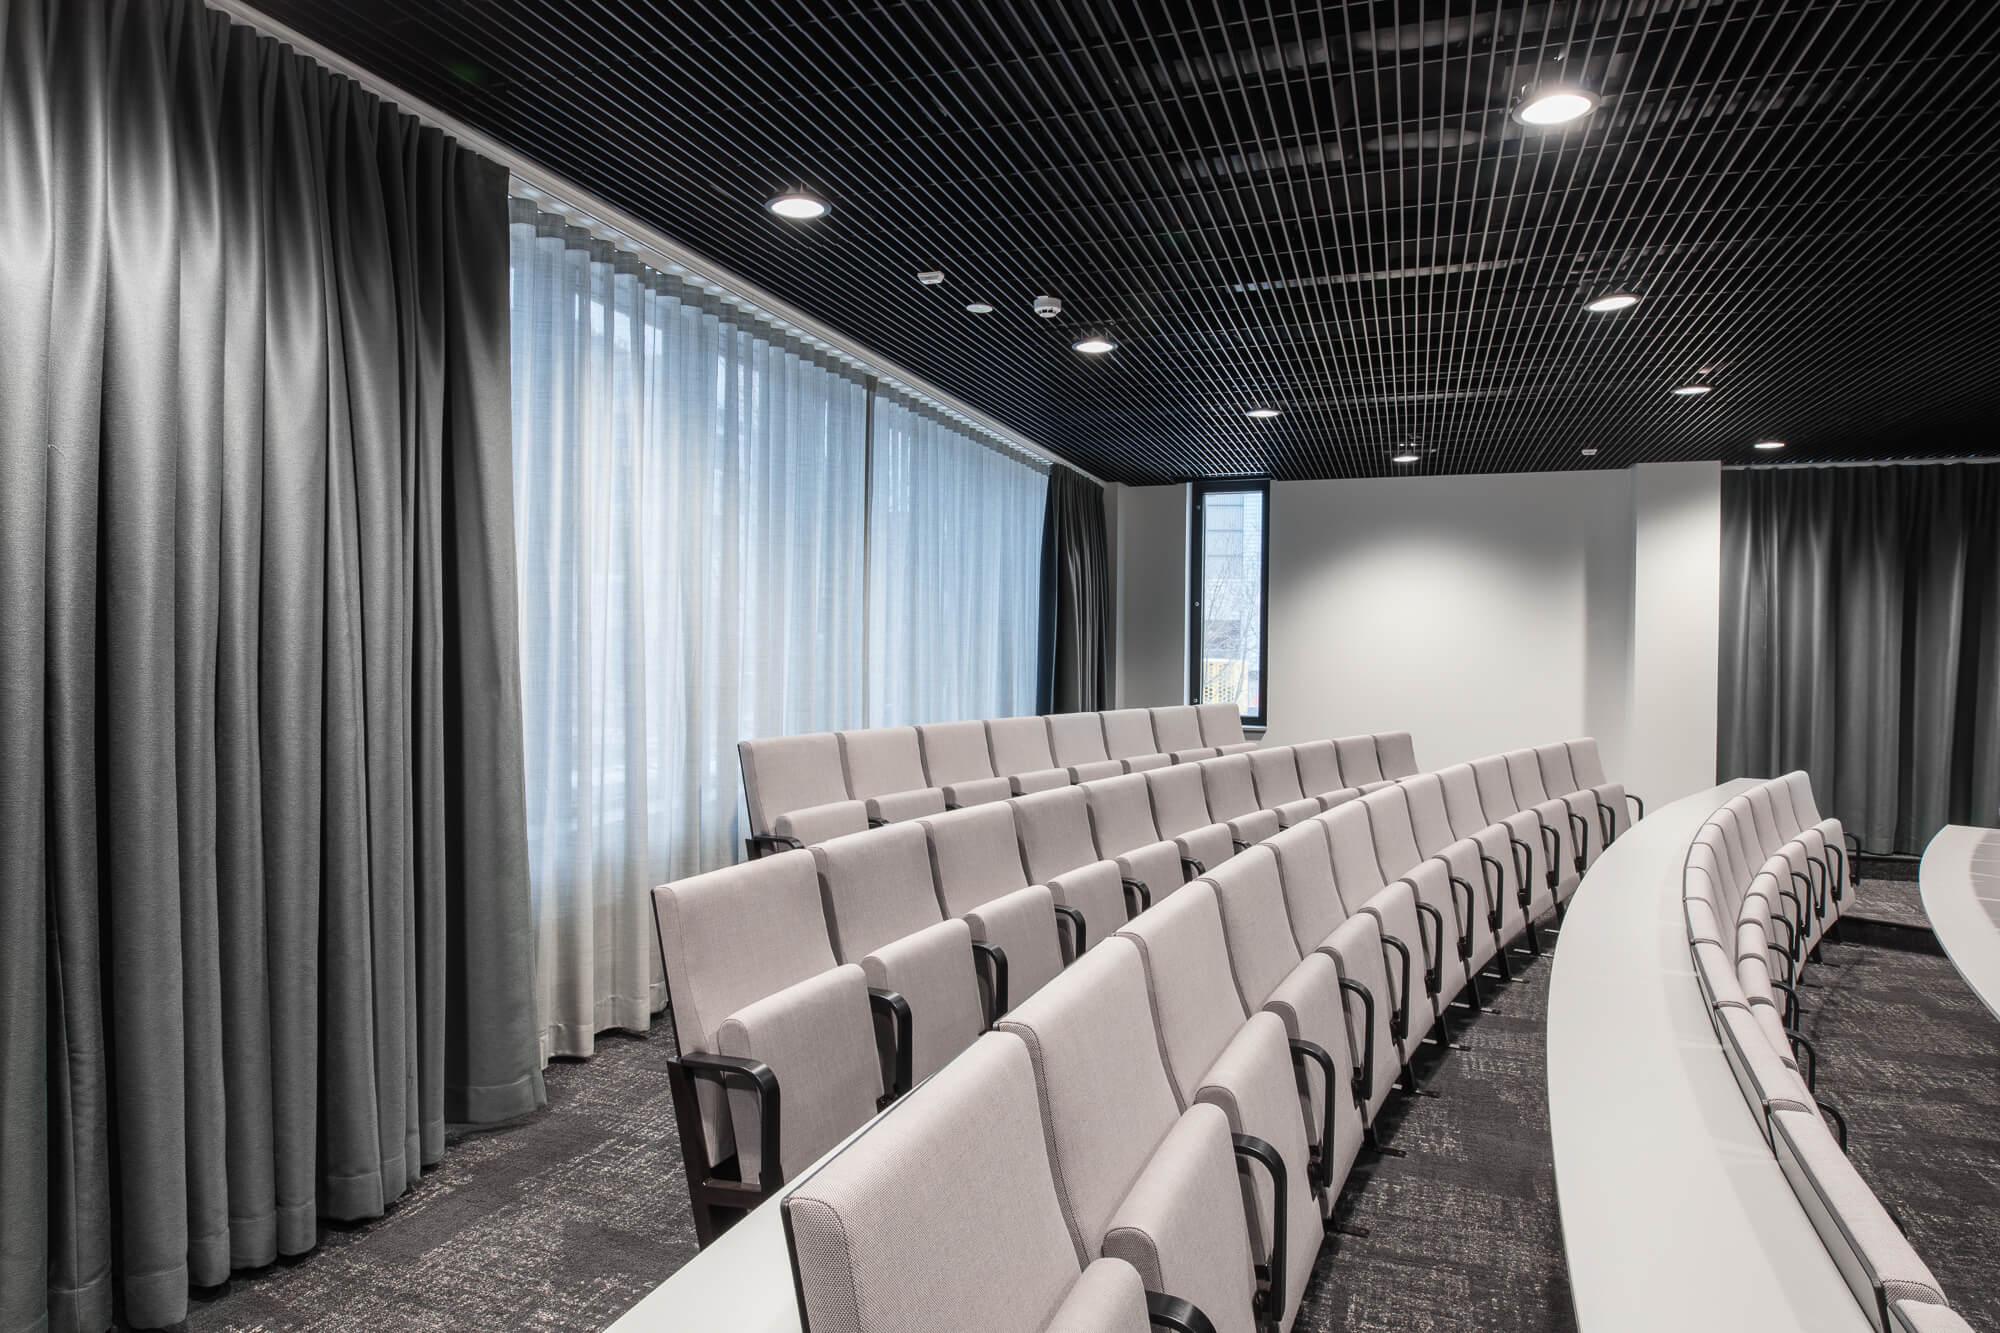 yrityskuvaus_tilakuvaus_auditorio